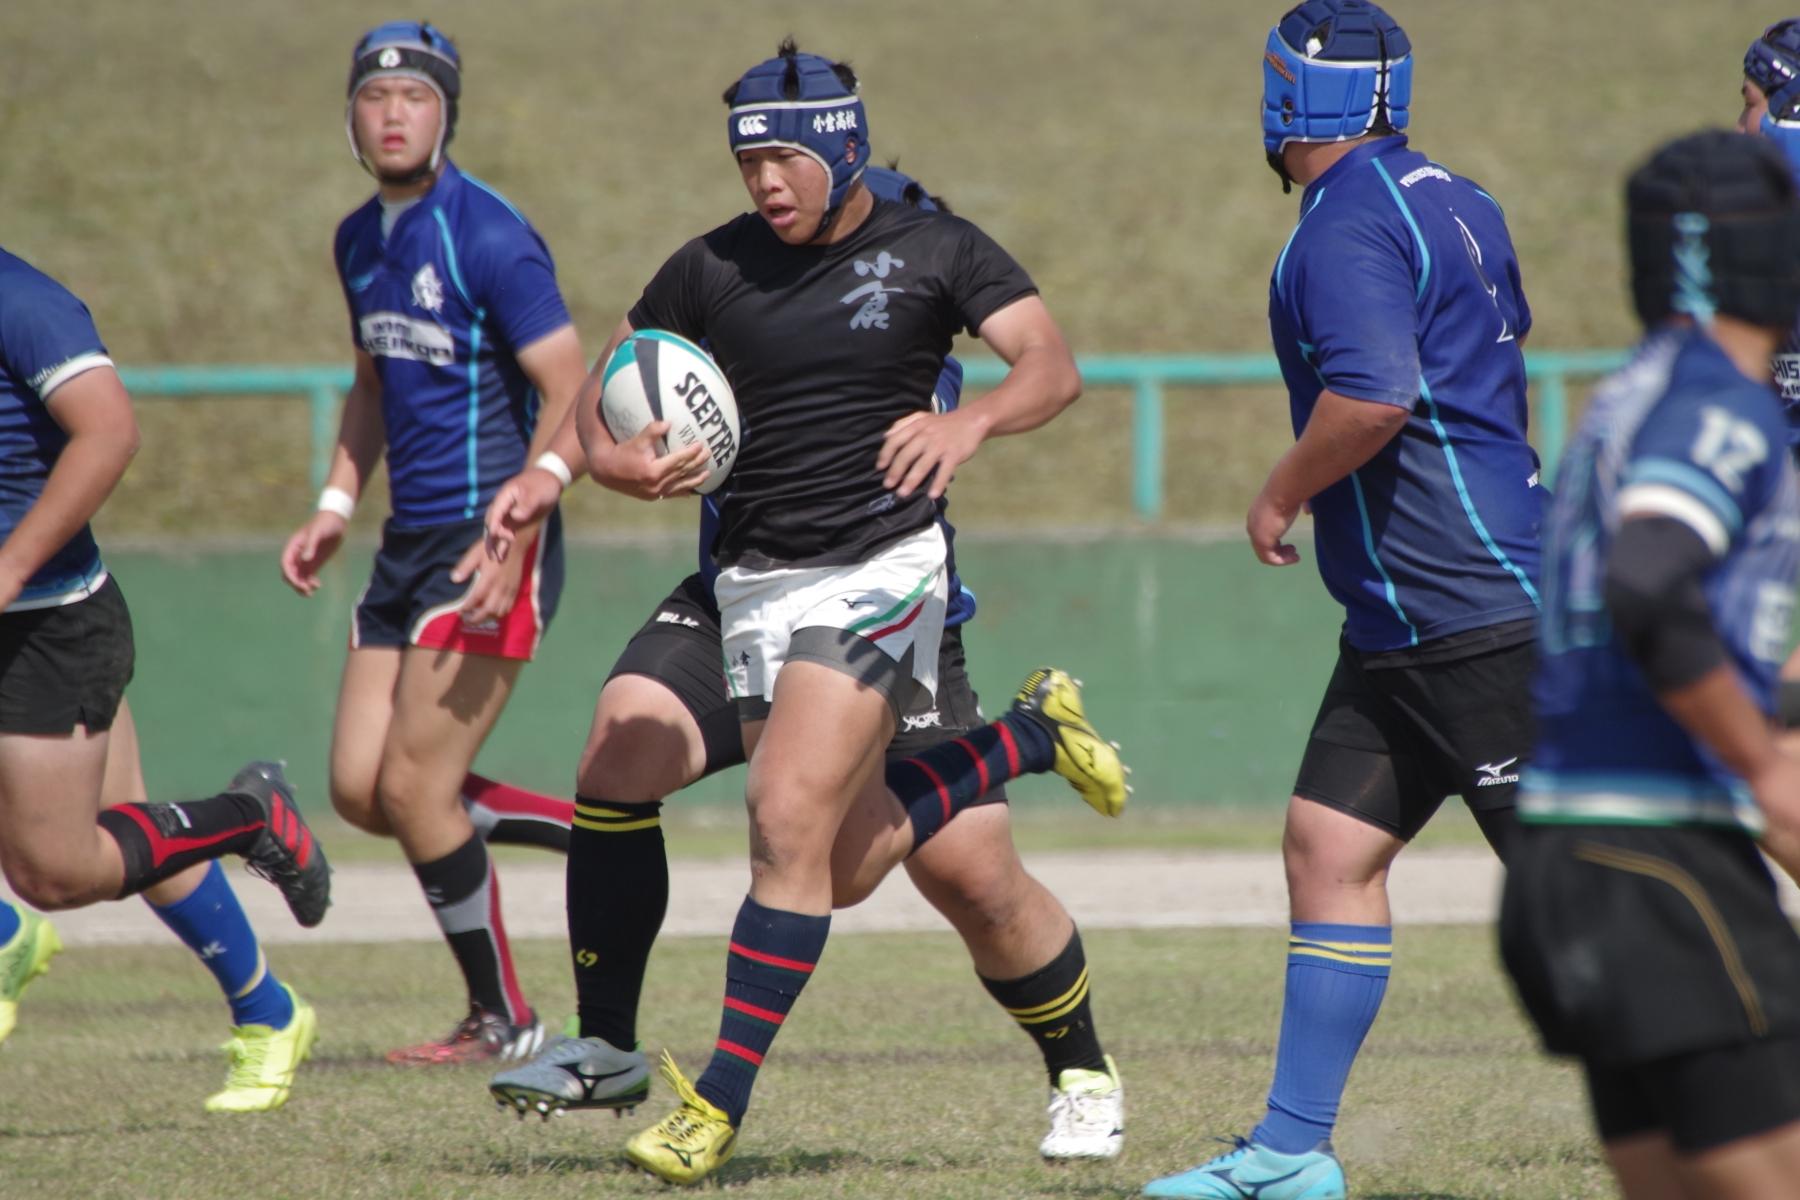 http://kokura-rugby.sakura.ne.jp/180428_145944.jpg